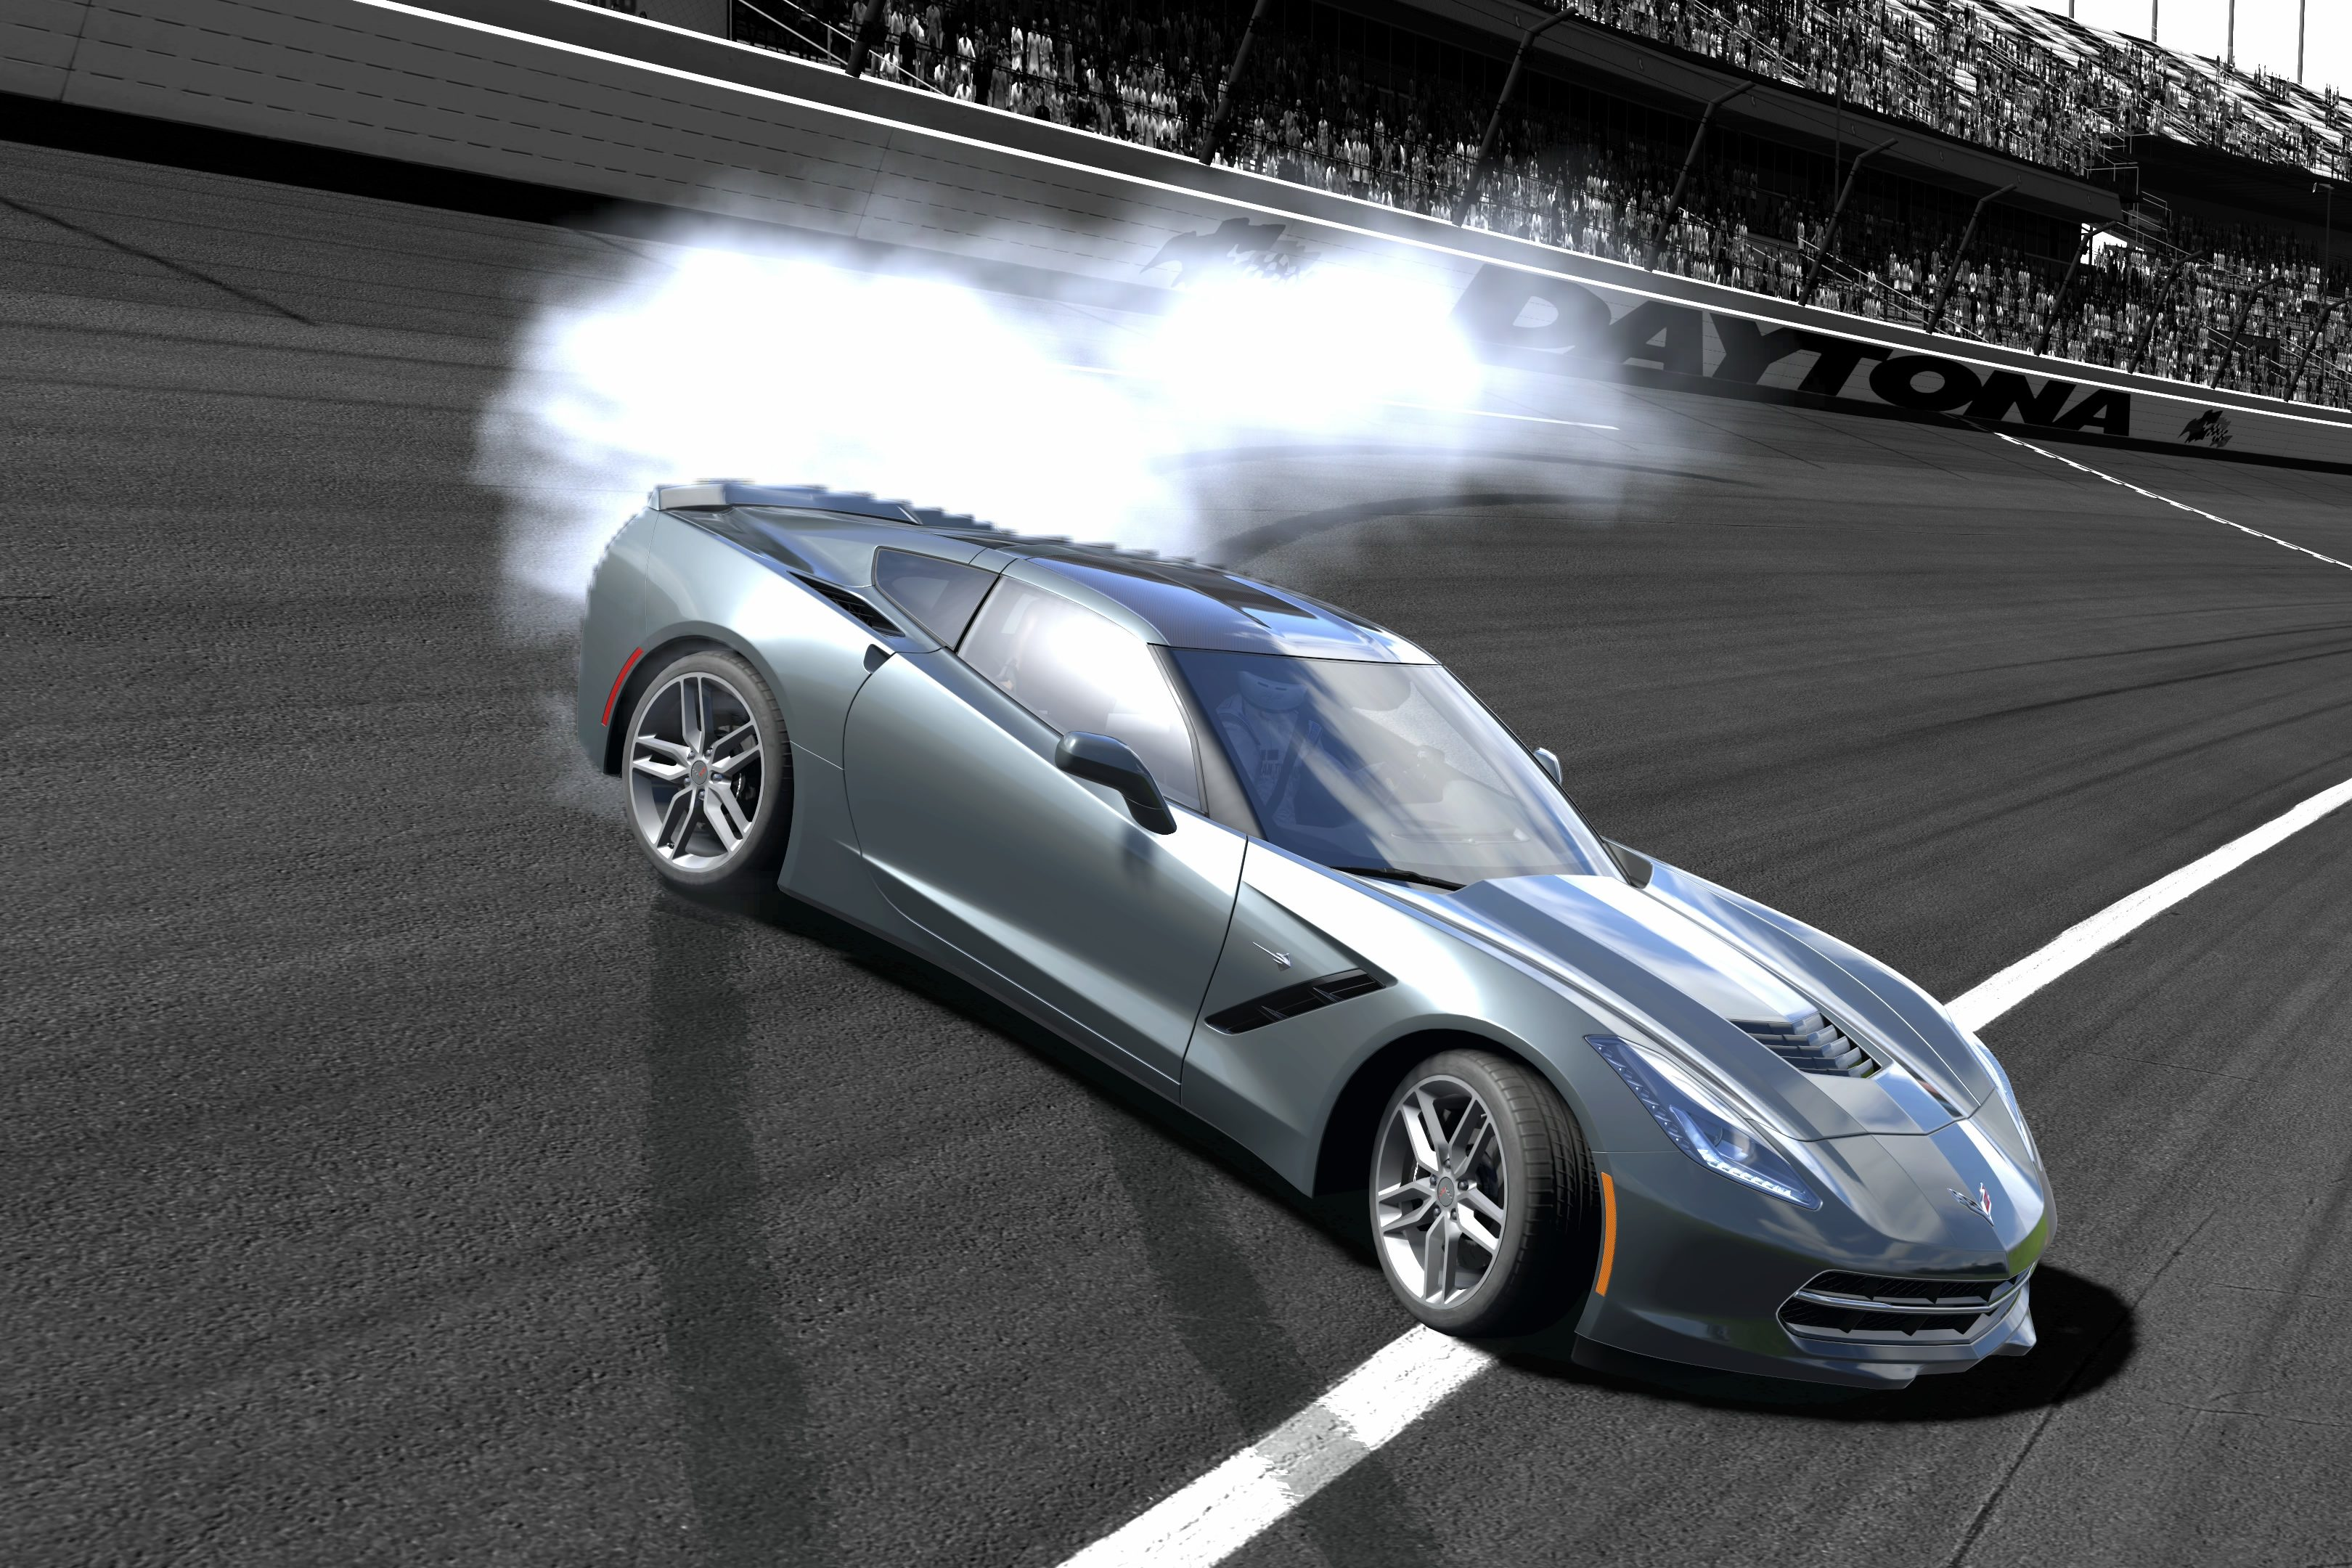 Road Course - Daytona_5.jpg